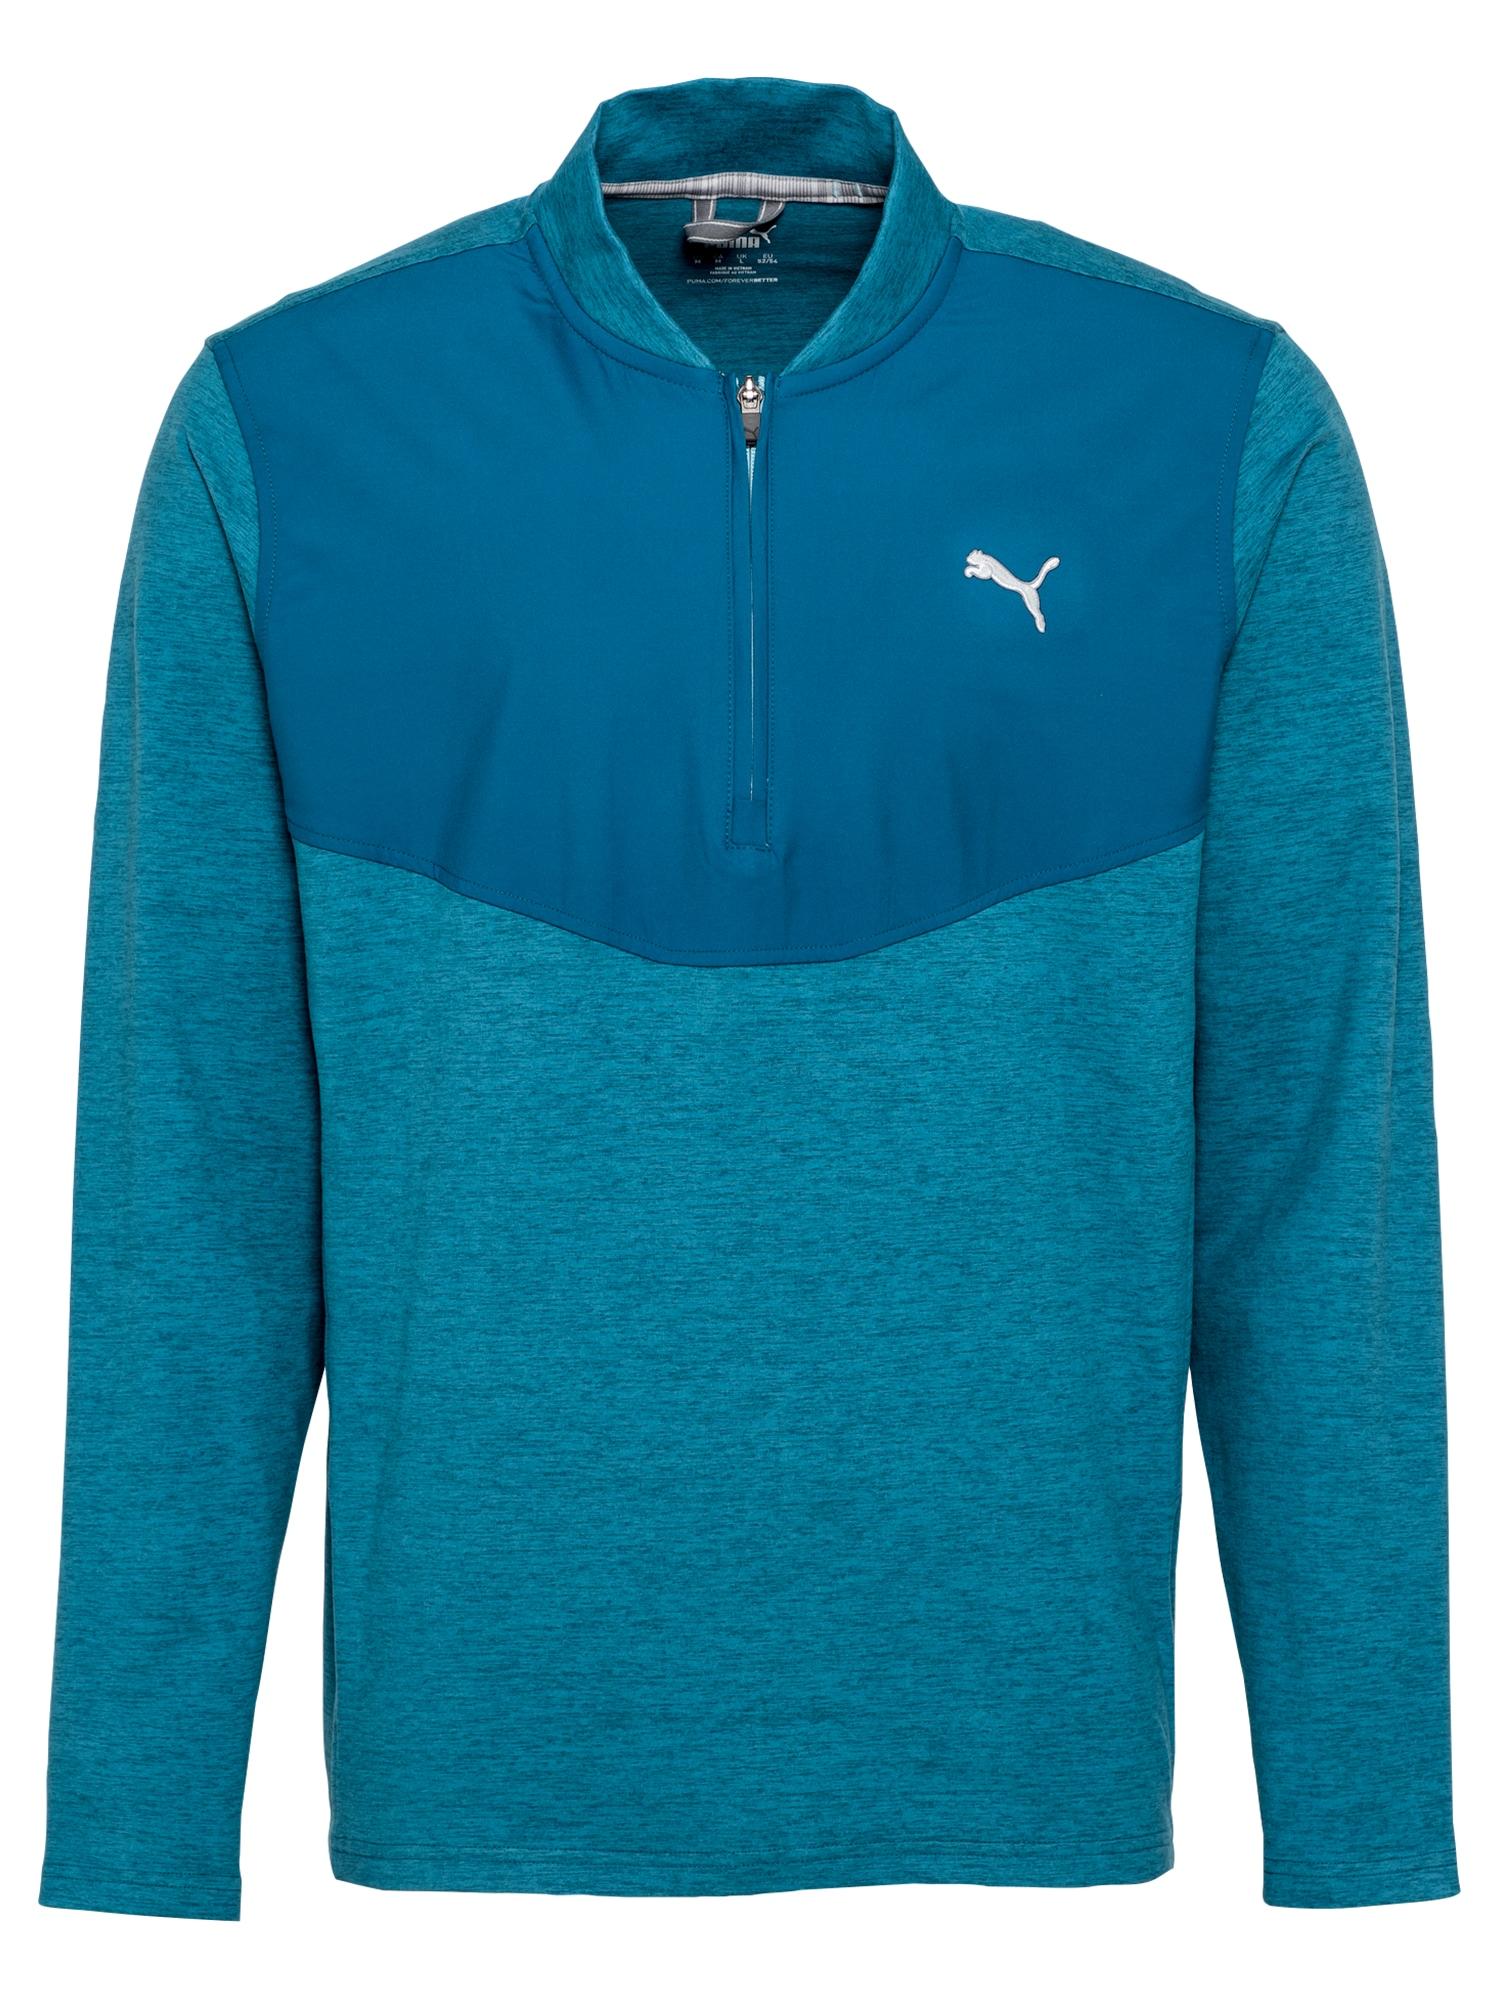 PUMA Sportinio tipo megztinis mėlyna / balta